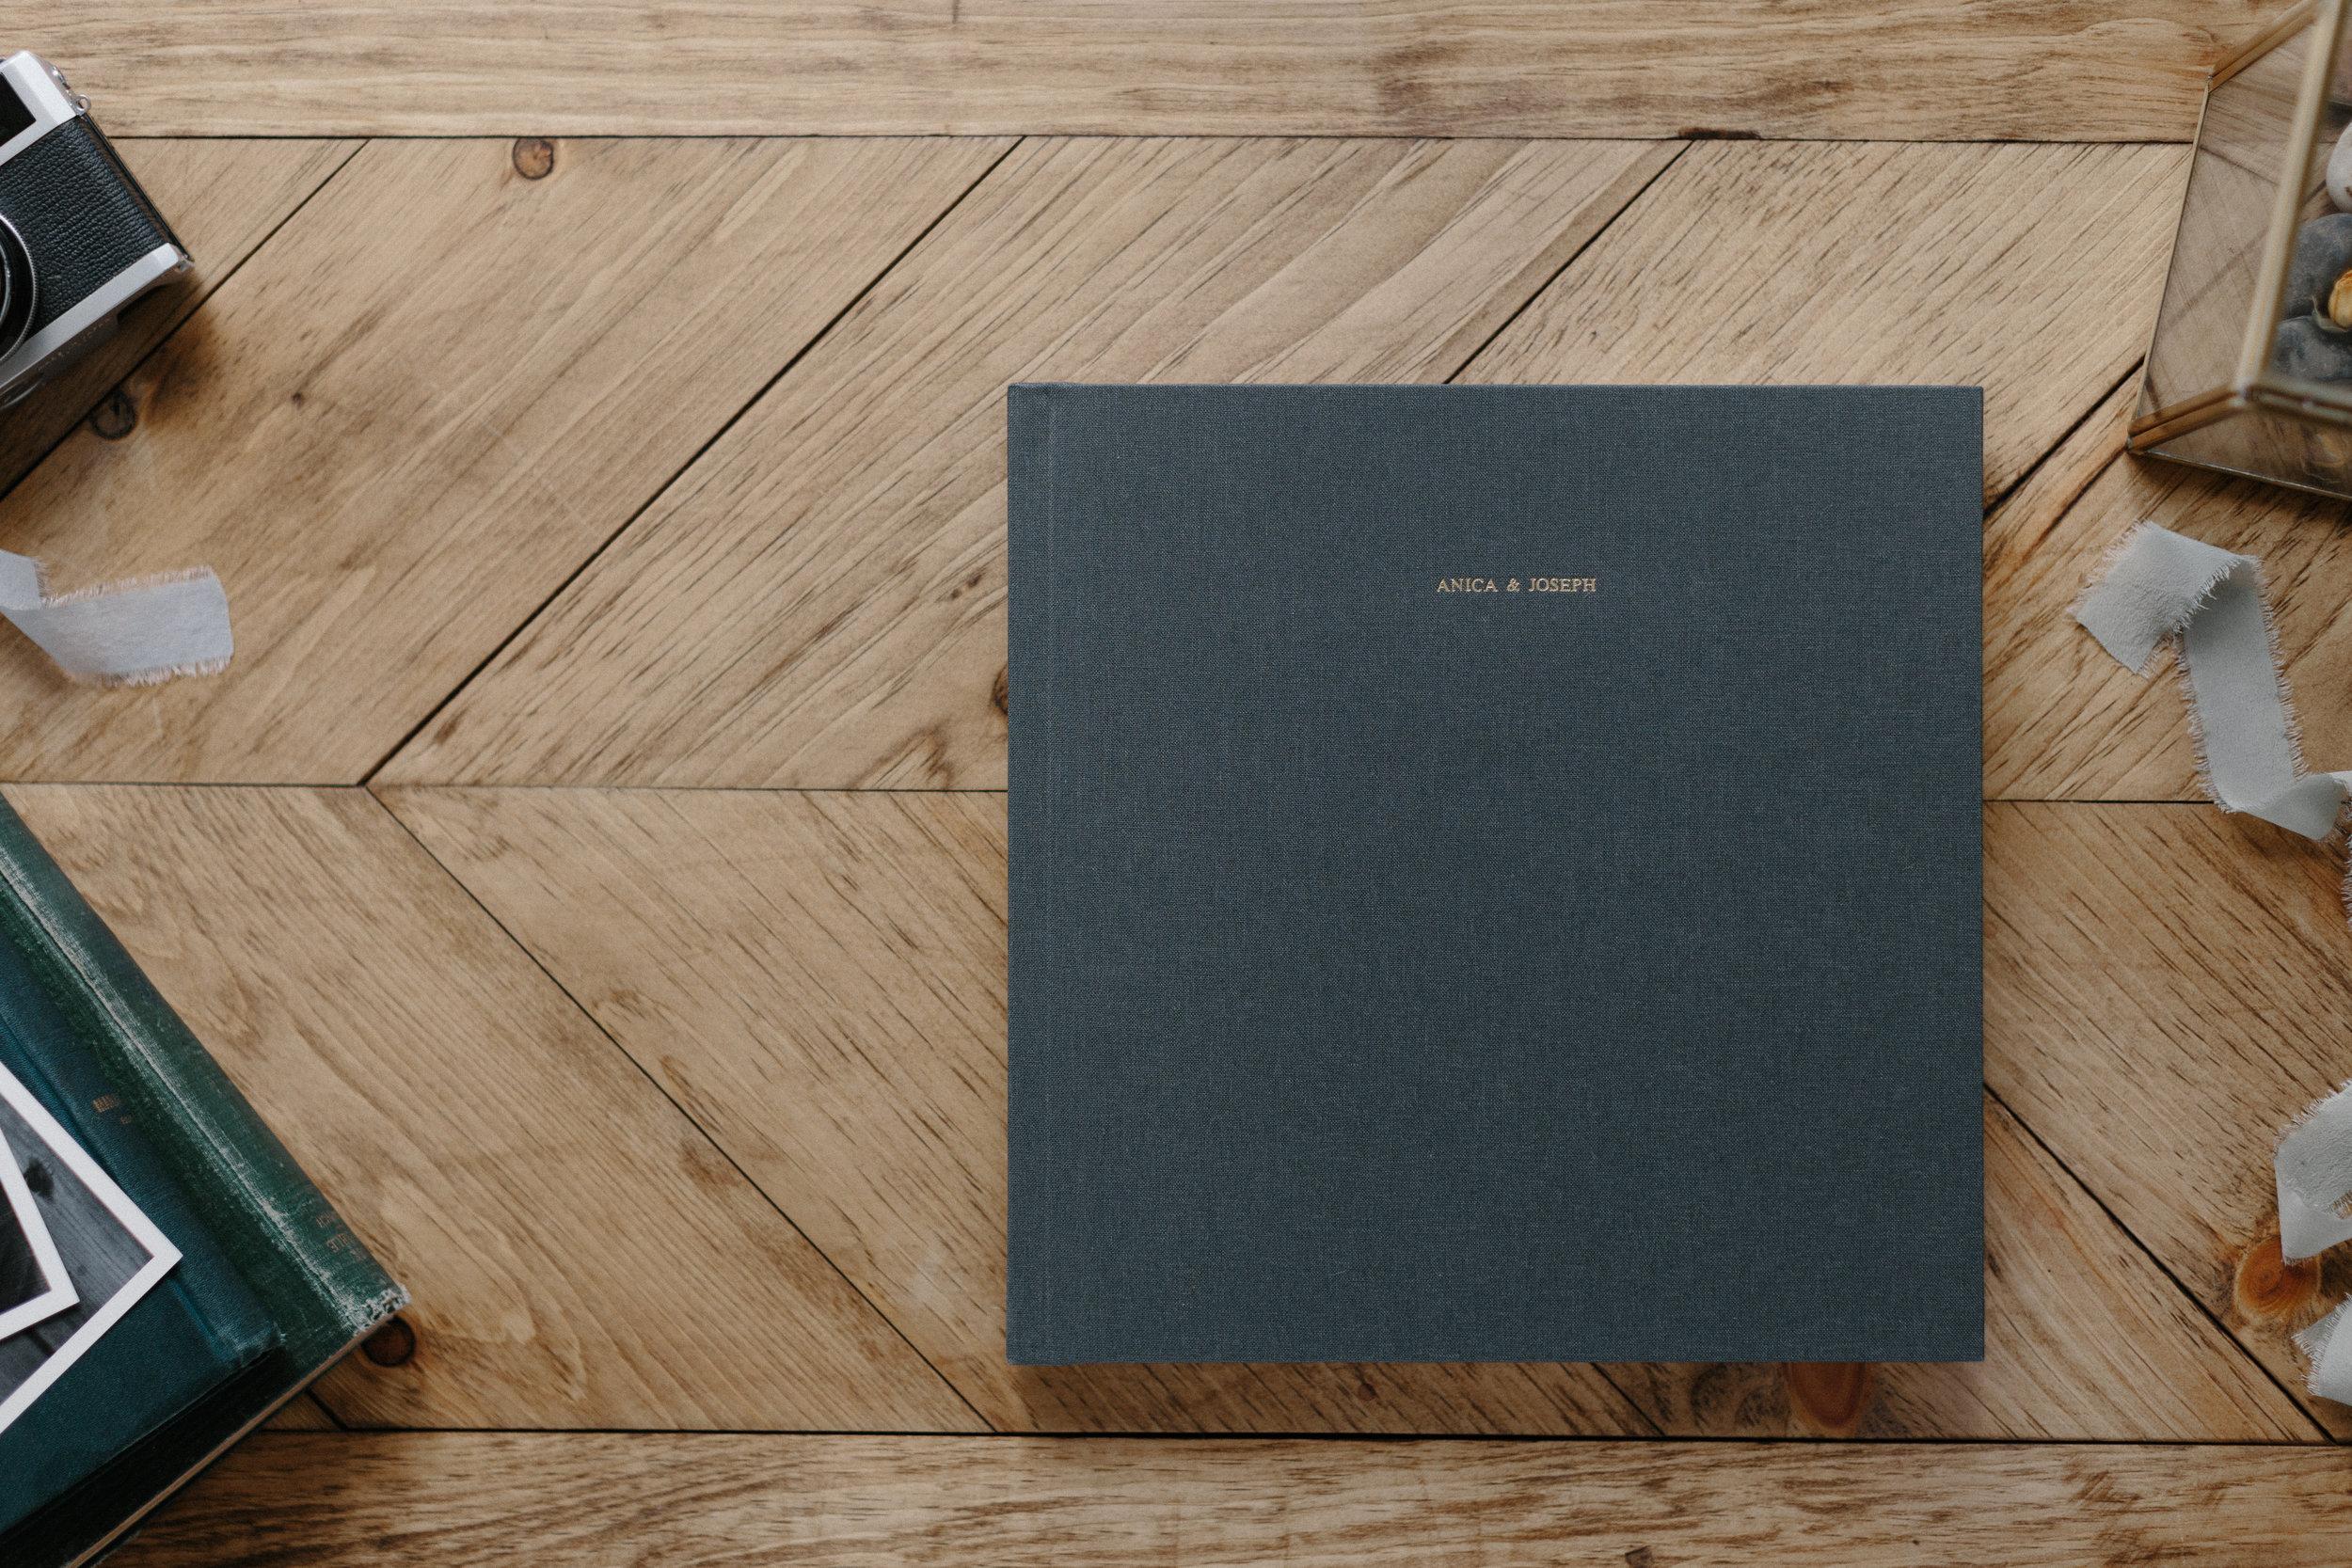 ryanne-hollies-photography-wedding-album-design-details-tono-and-co-artifact-uprising-101.jpg